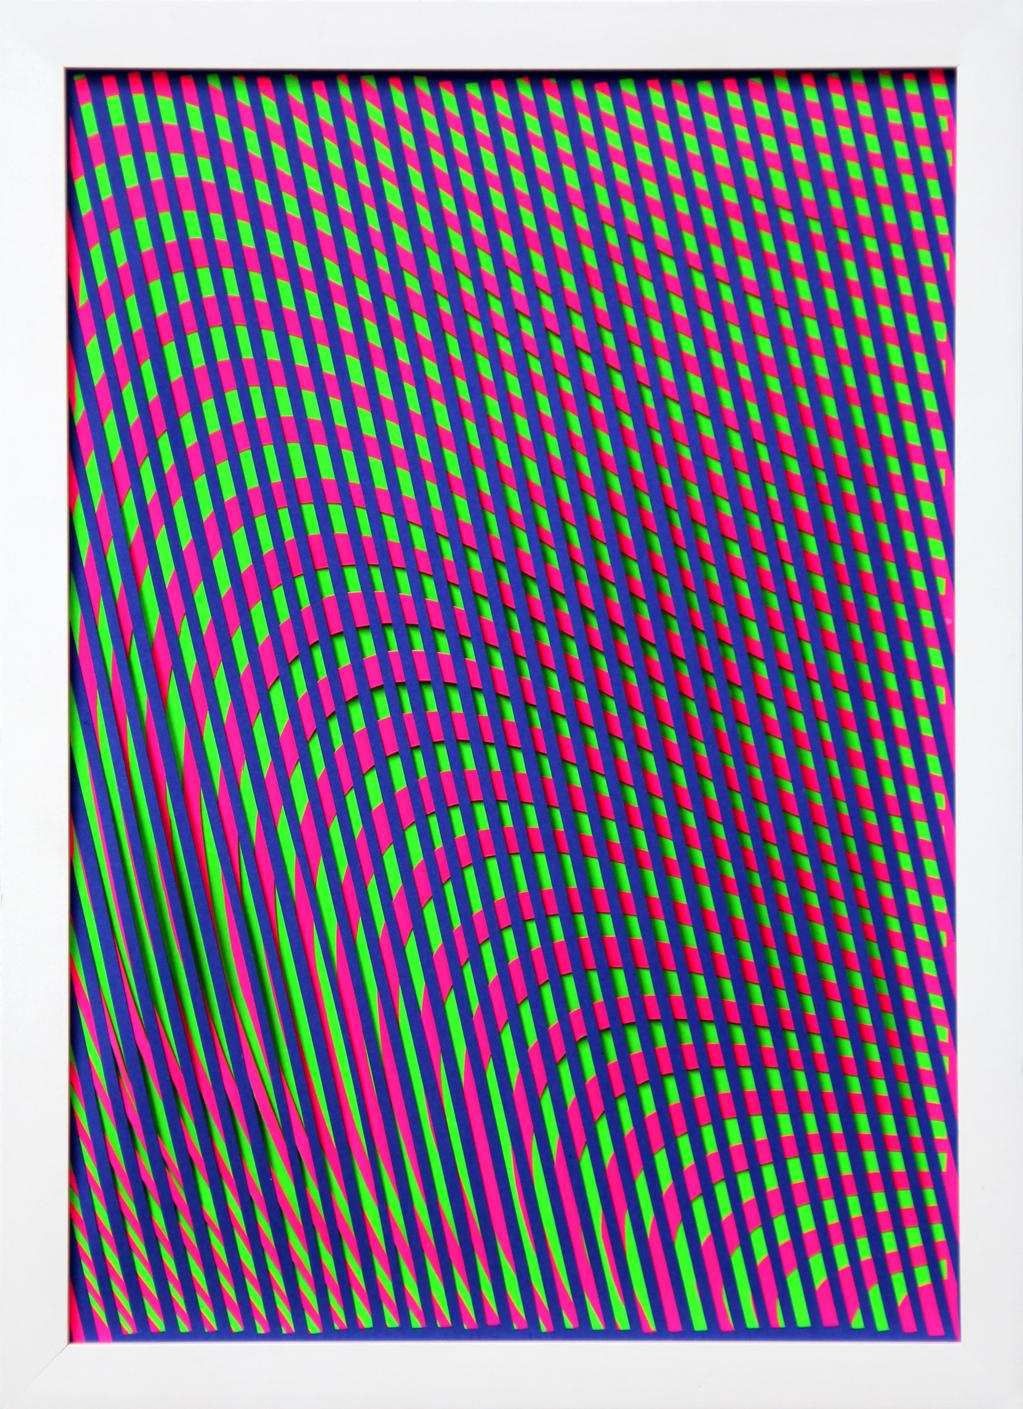 mozart #1, 21 x 29 cm, 2017